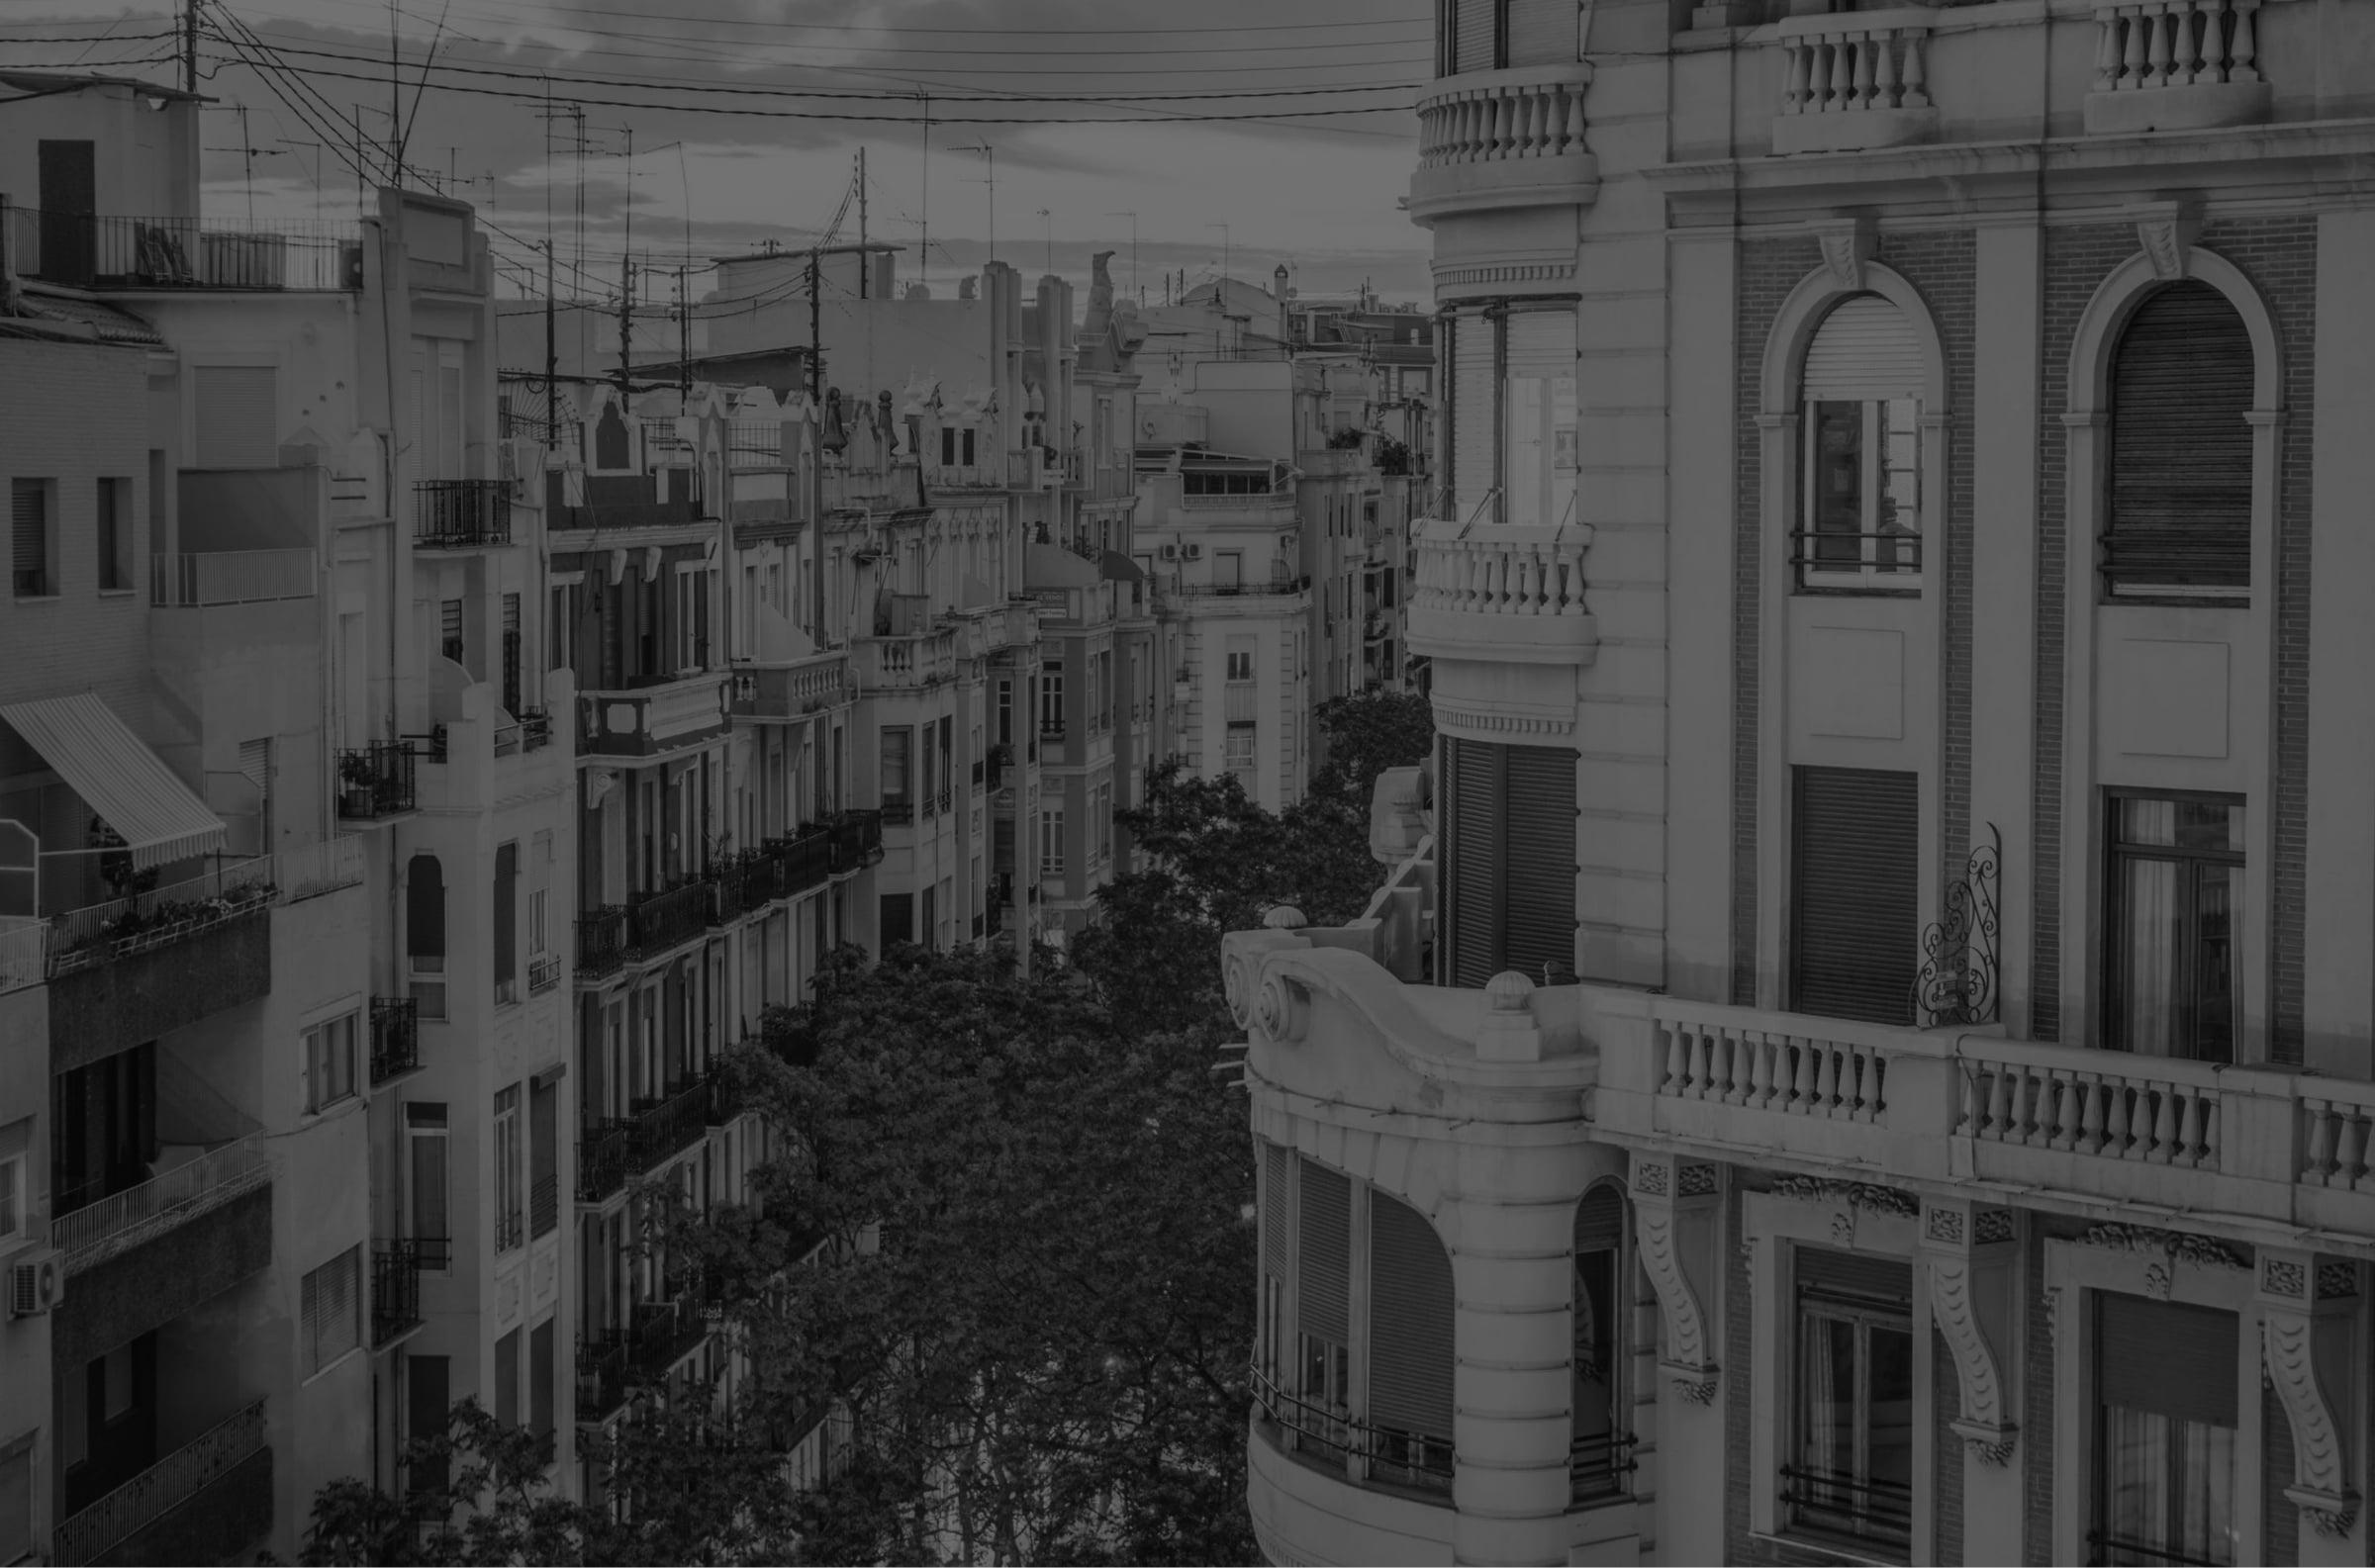 Valencia general view